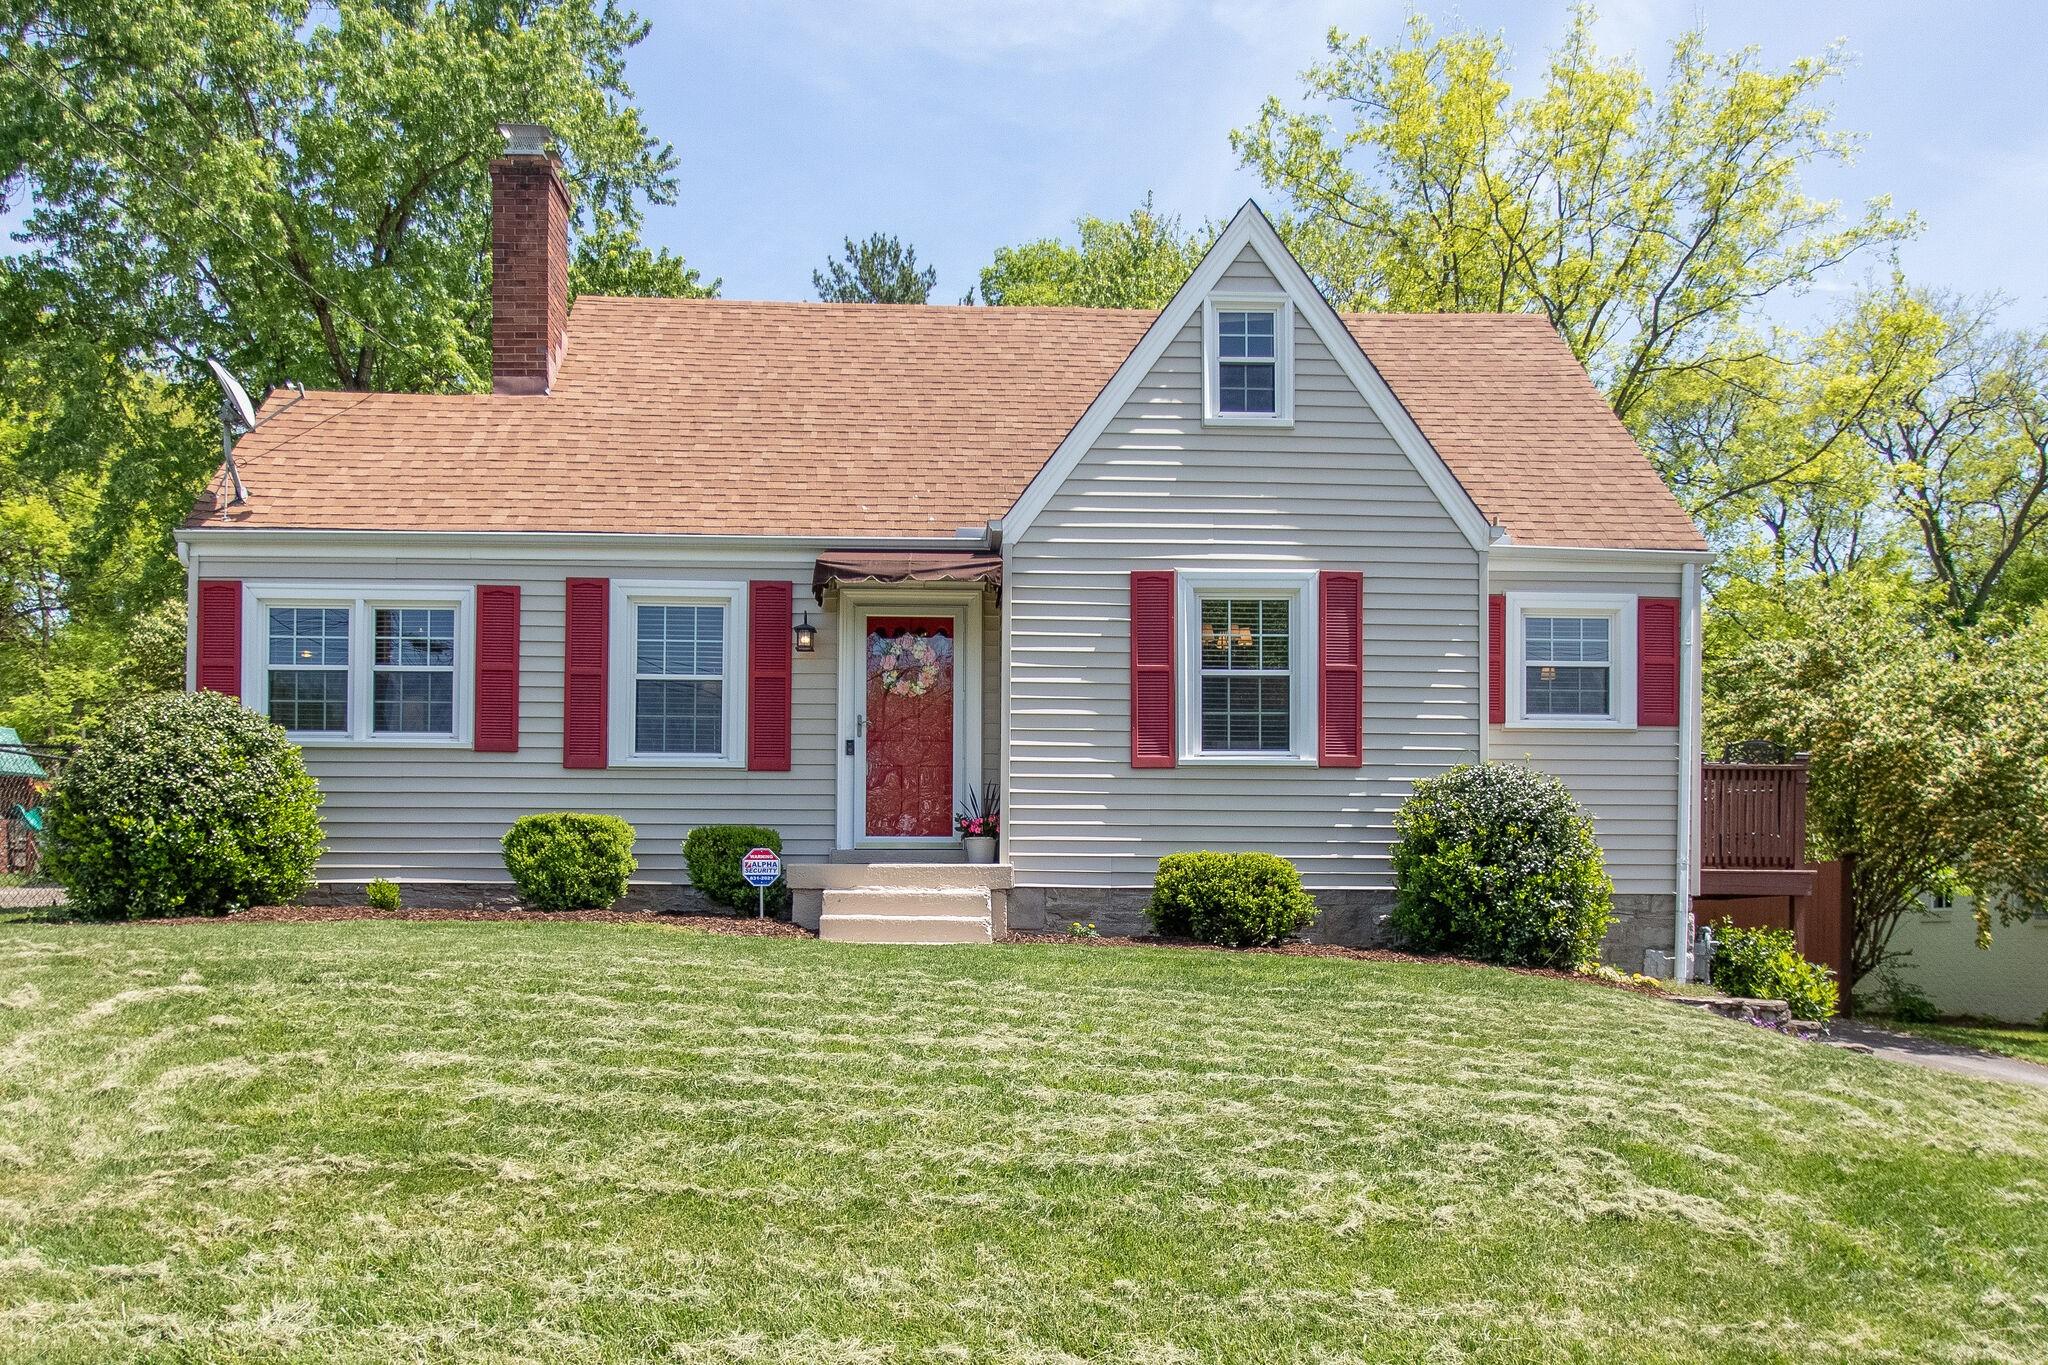 2910 Primrose Cir Property Photo - Nashville, TN real estate listing